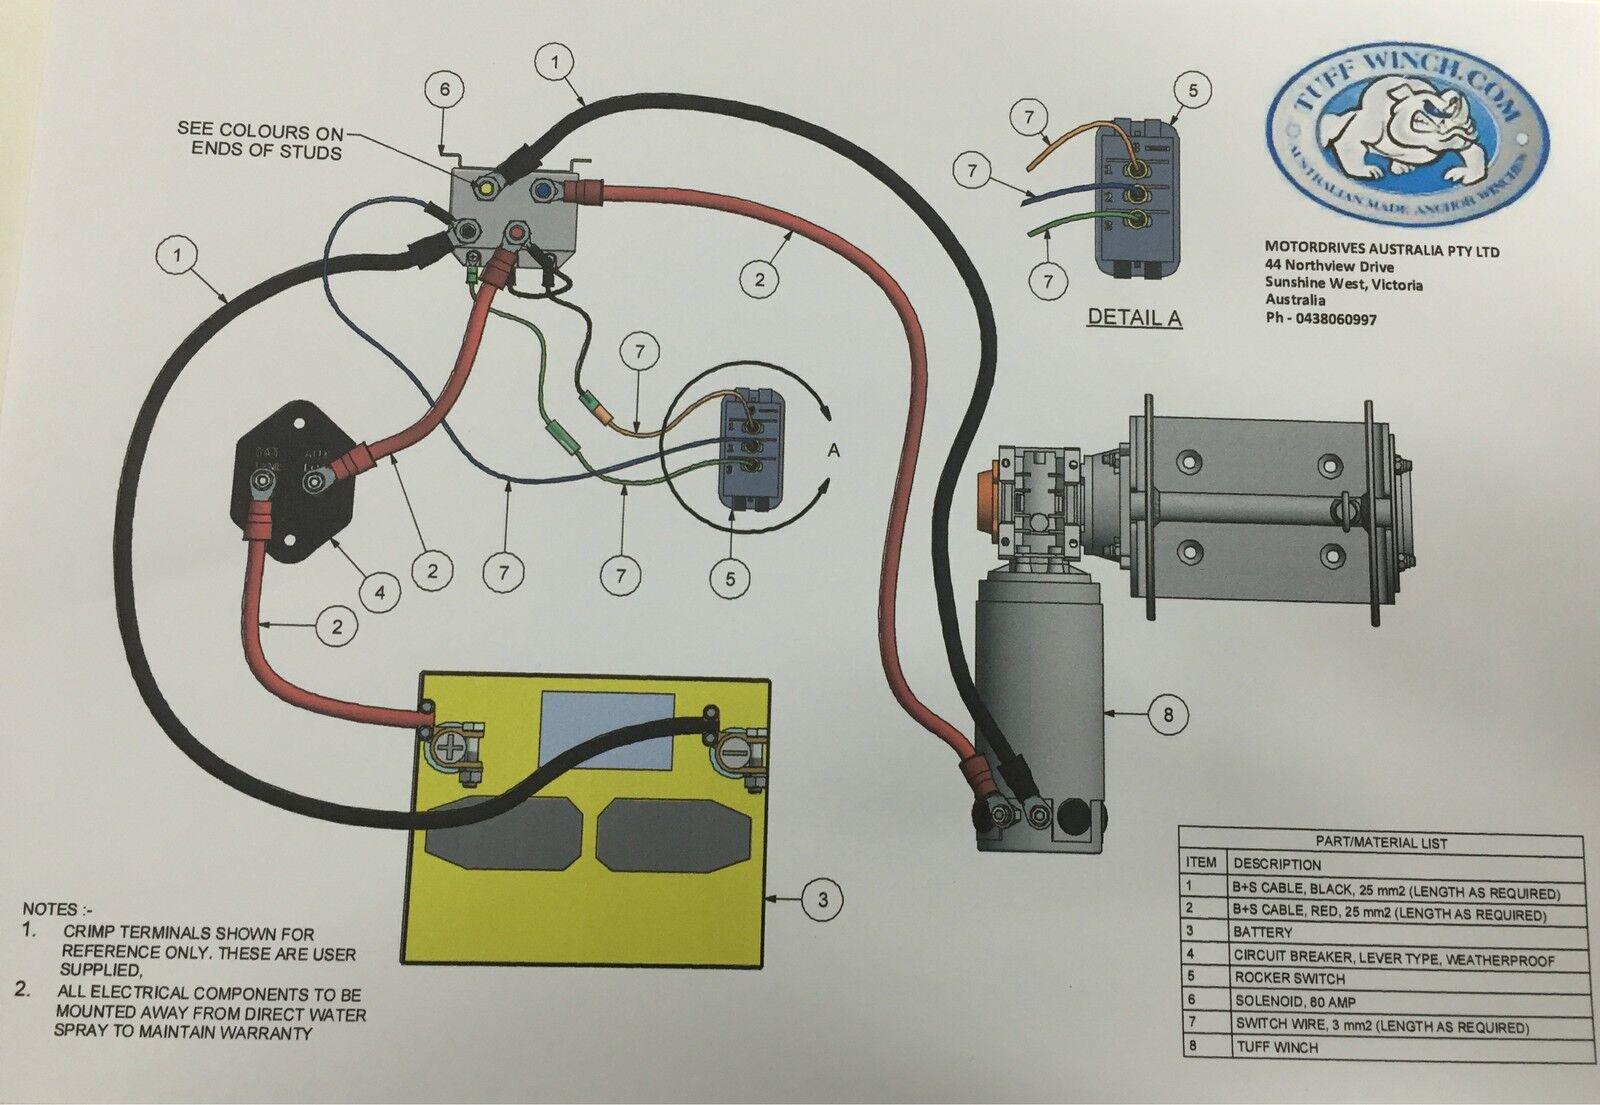 Tuff Tw180 Ebay Stuff Winch Wiring Diagram